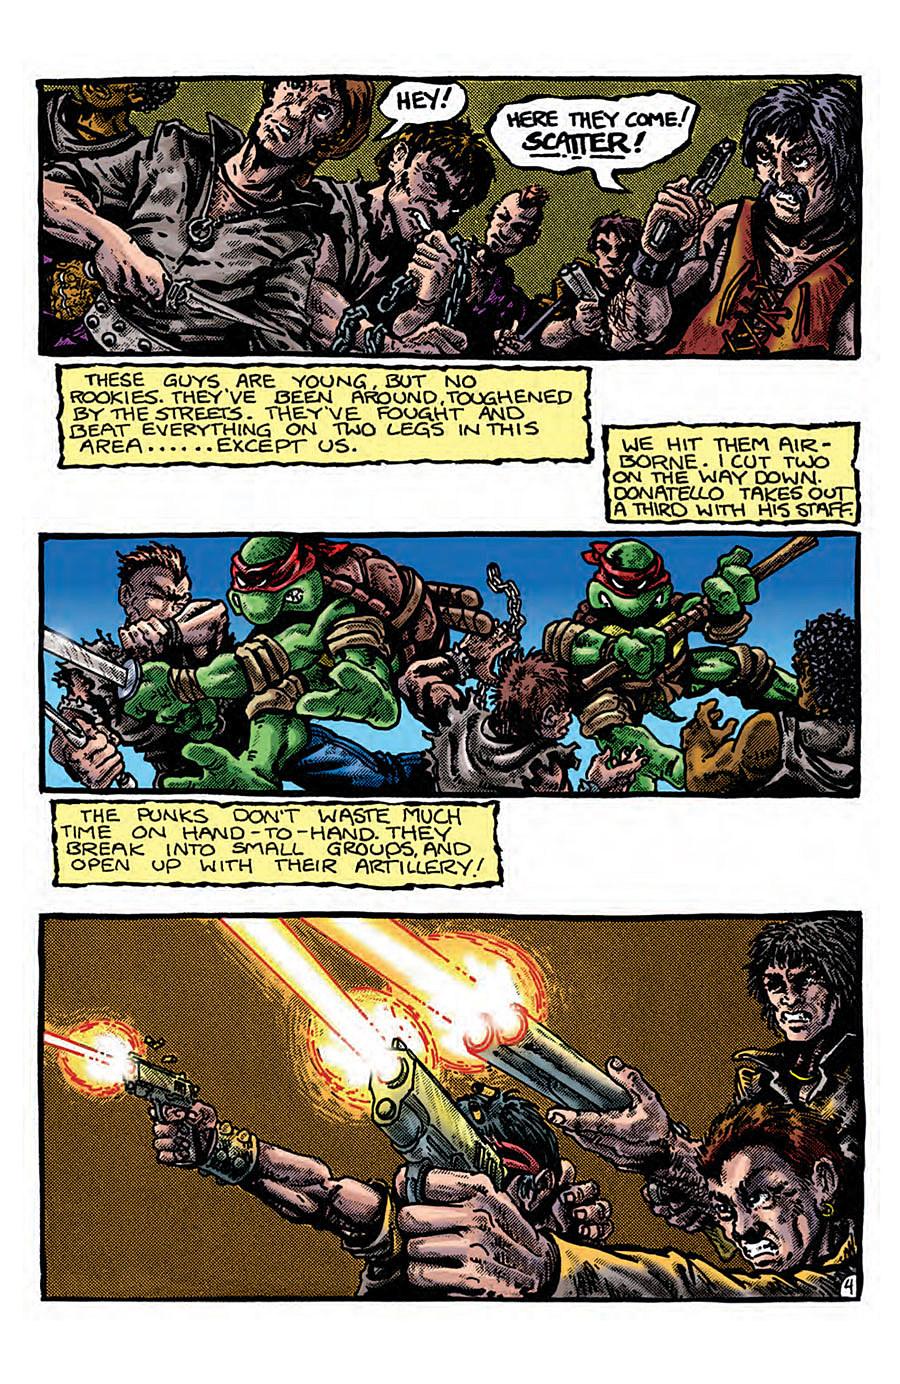 �teenage mutant ninja turtles color classics� 1 comes out